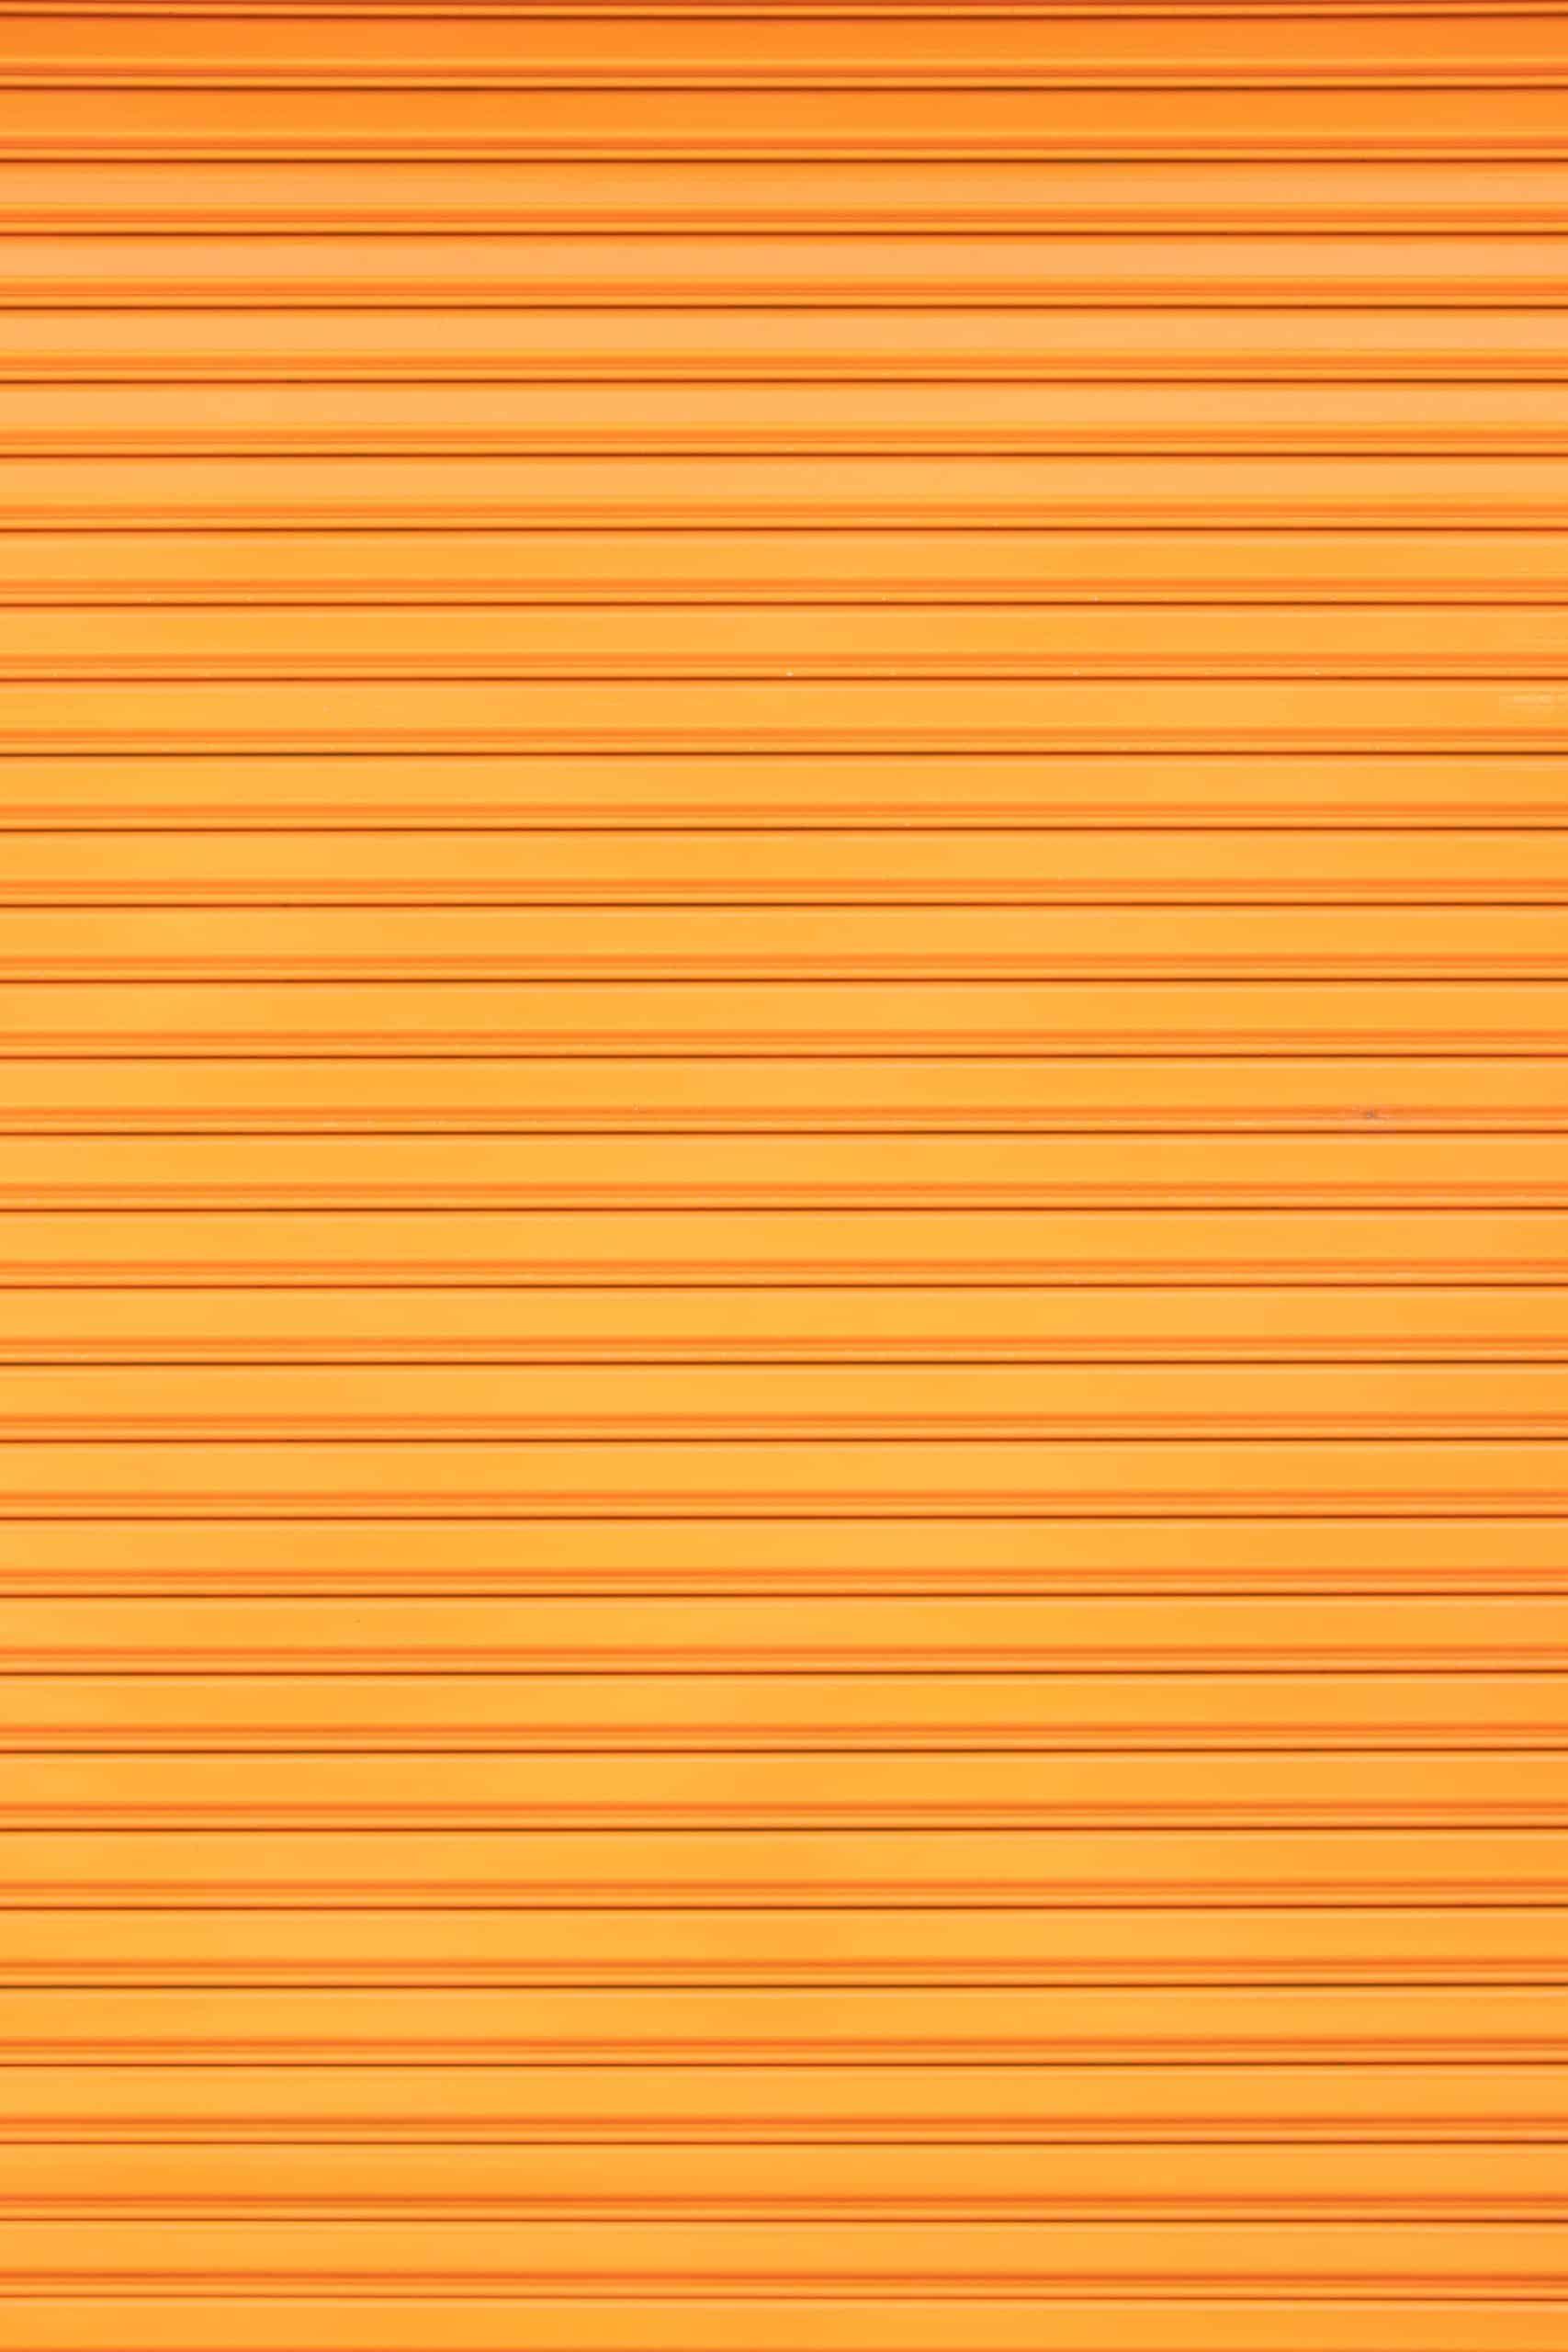 Automatic Garage Door Installation Article Image